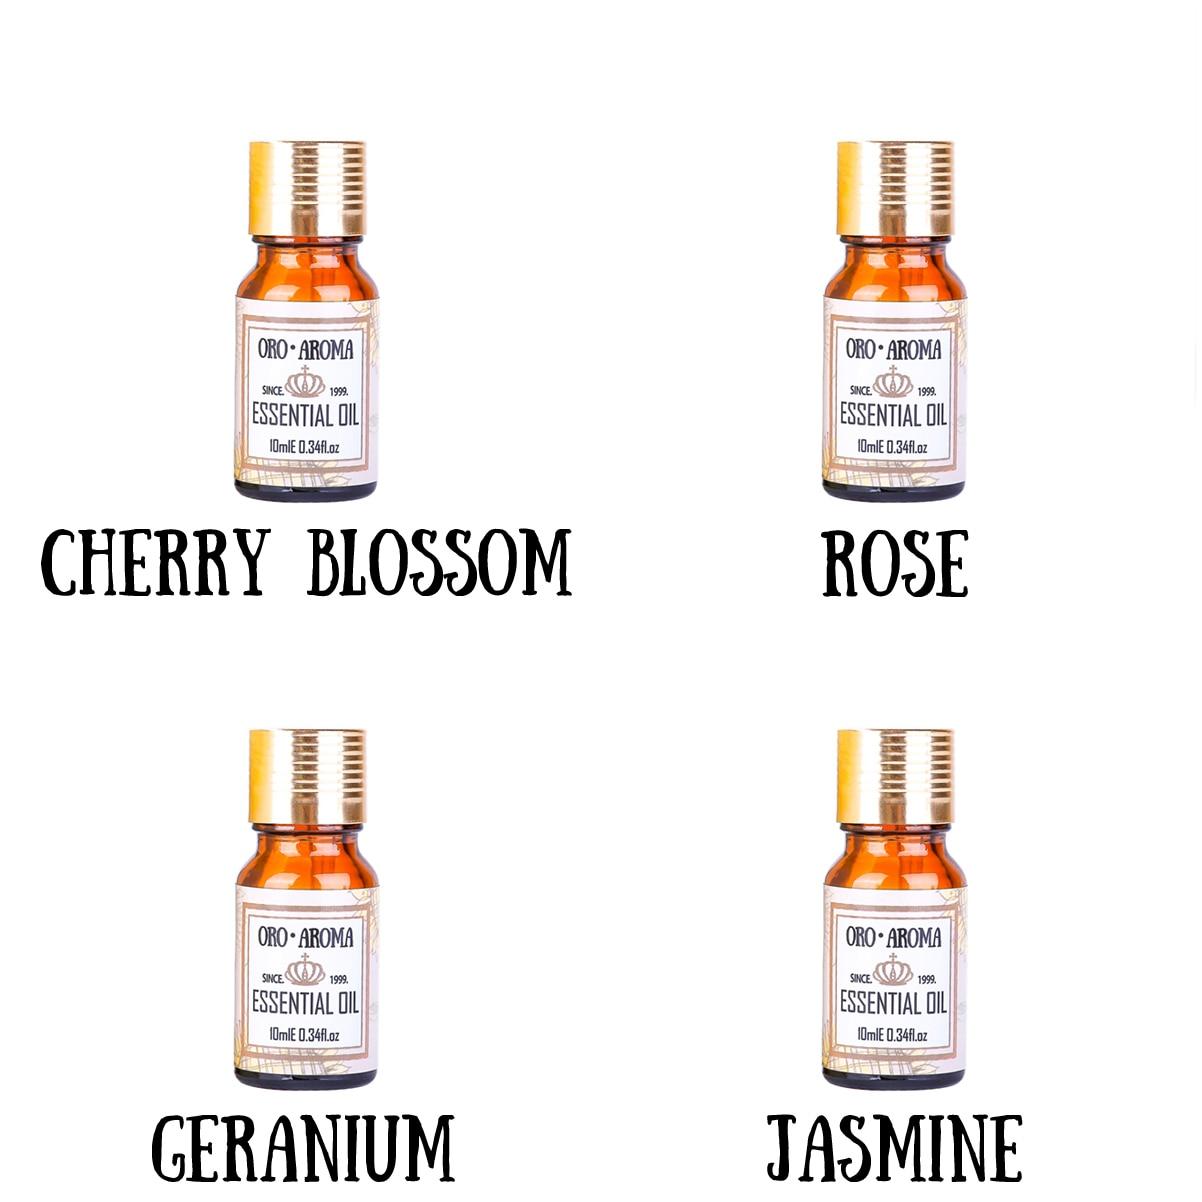 Famous brand oroaroma Cherry blossom rose geranium jasmine essential oil Essential Oils Aromatherapy, Massage,Spa, Bath 10ml*4